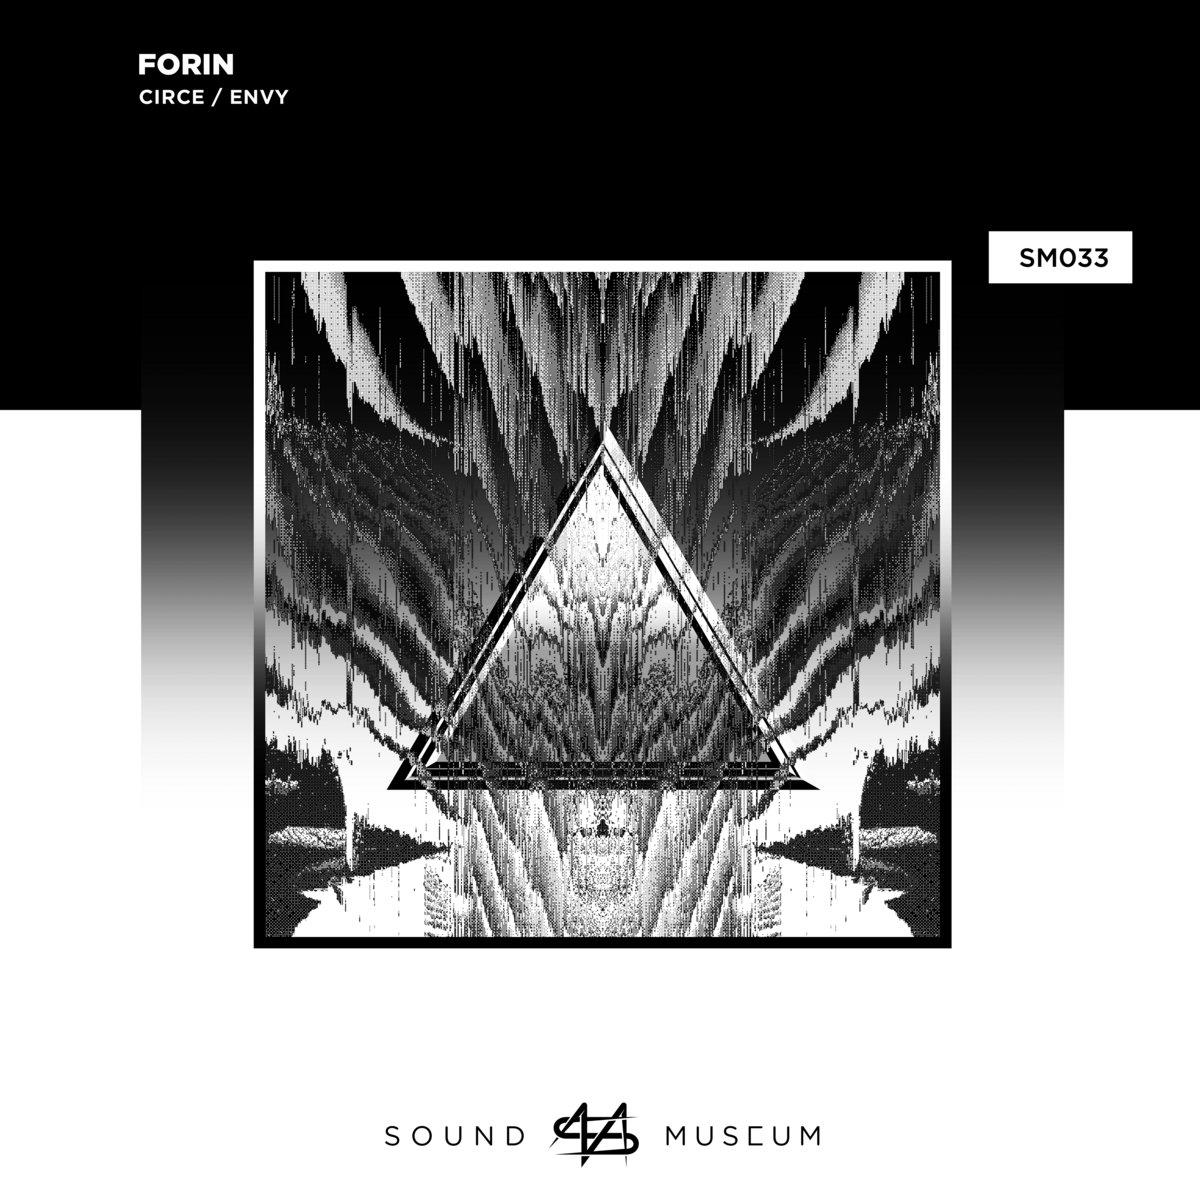 Forin – Circe / Envy